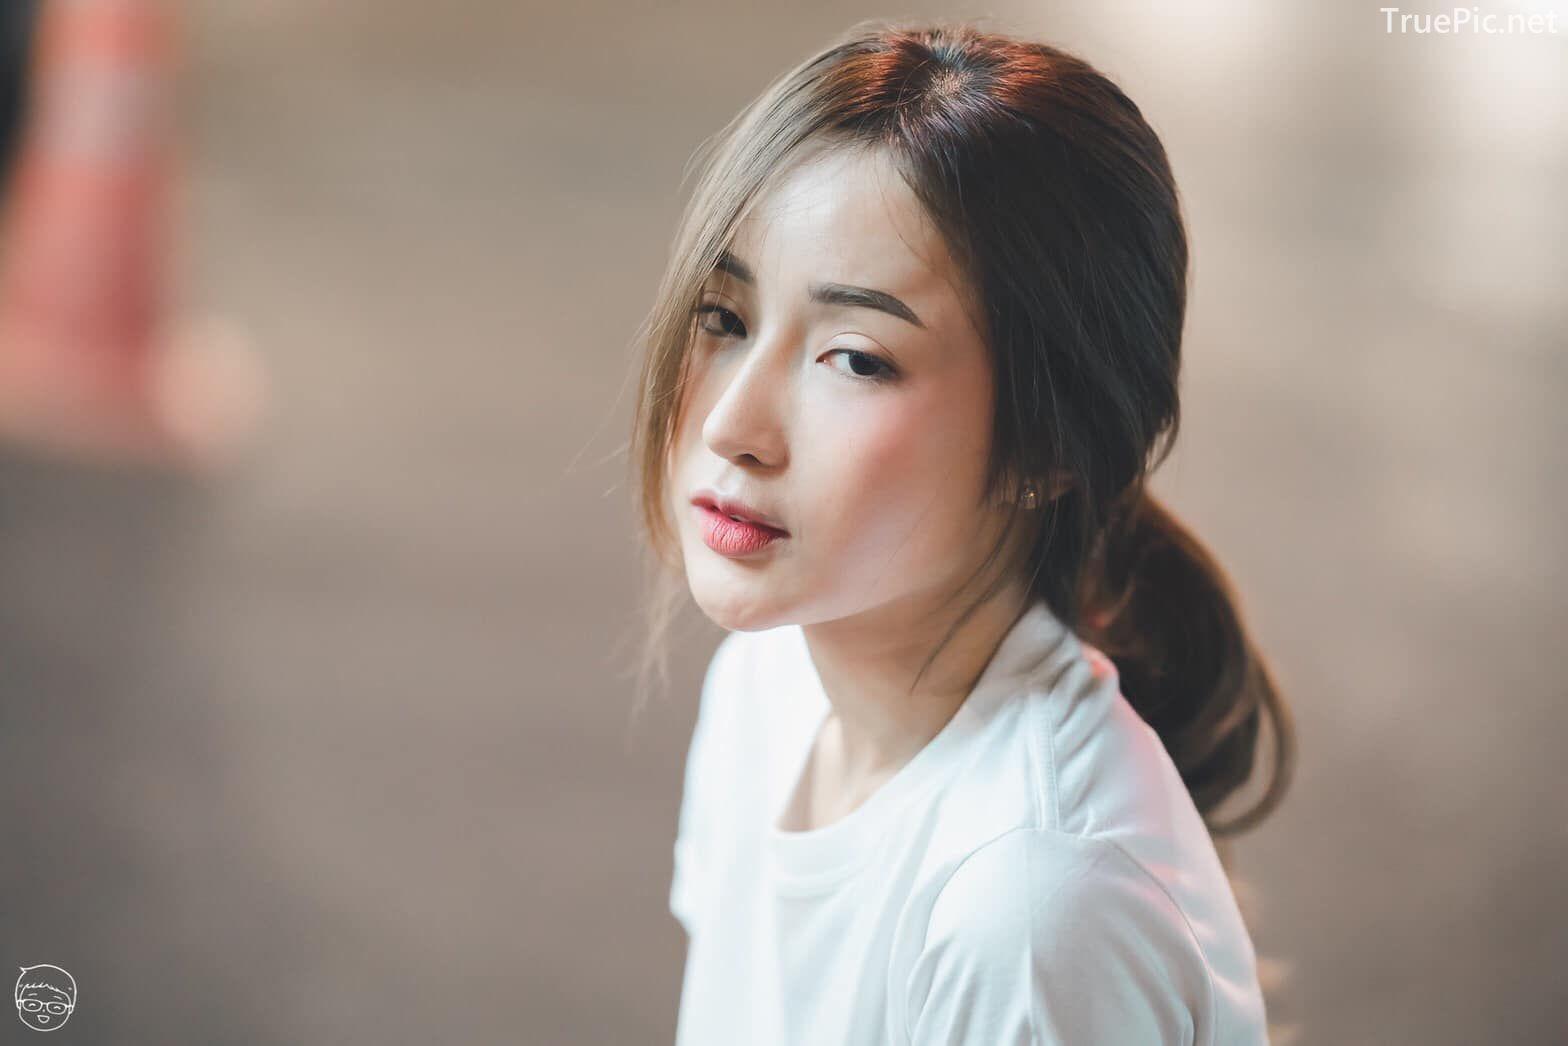 Thailand Hot Girl - Thanyarat Charoenpornkittada - Bustling City Tours - TruePic.net - Picture 10